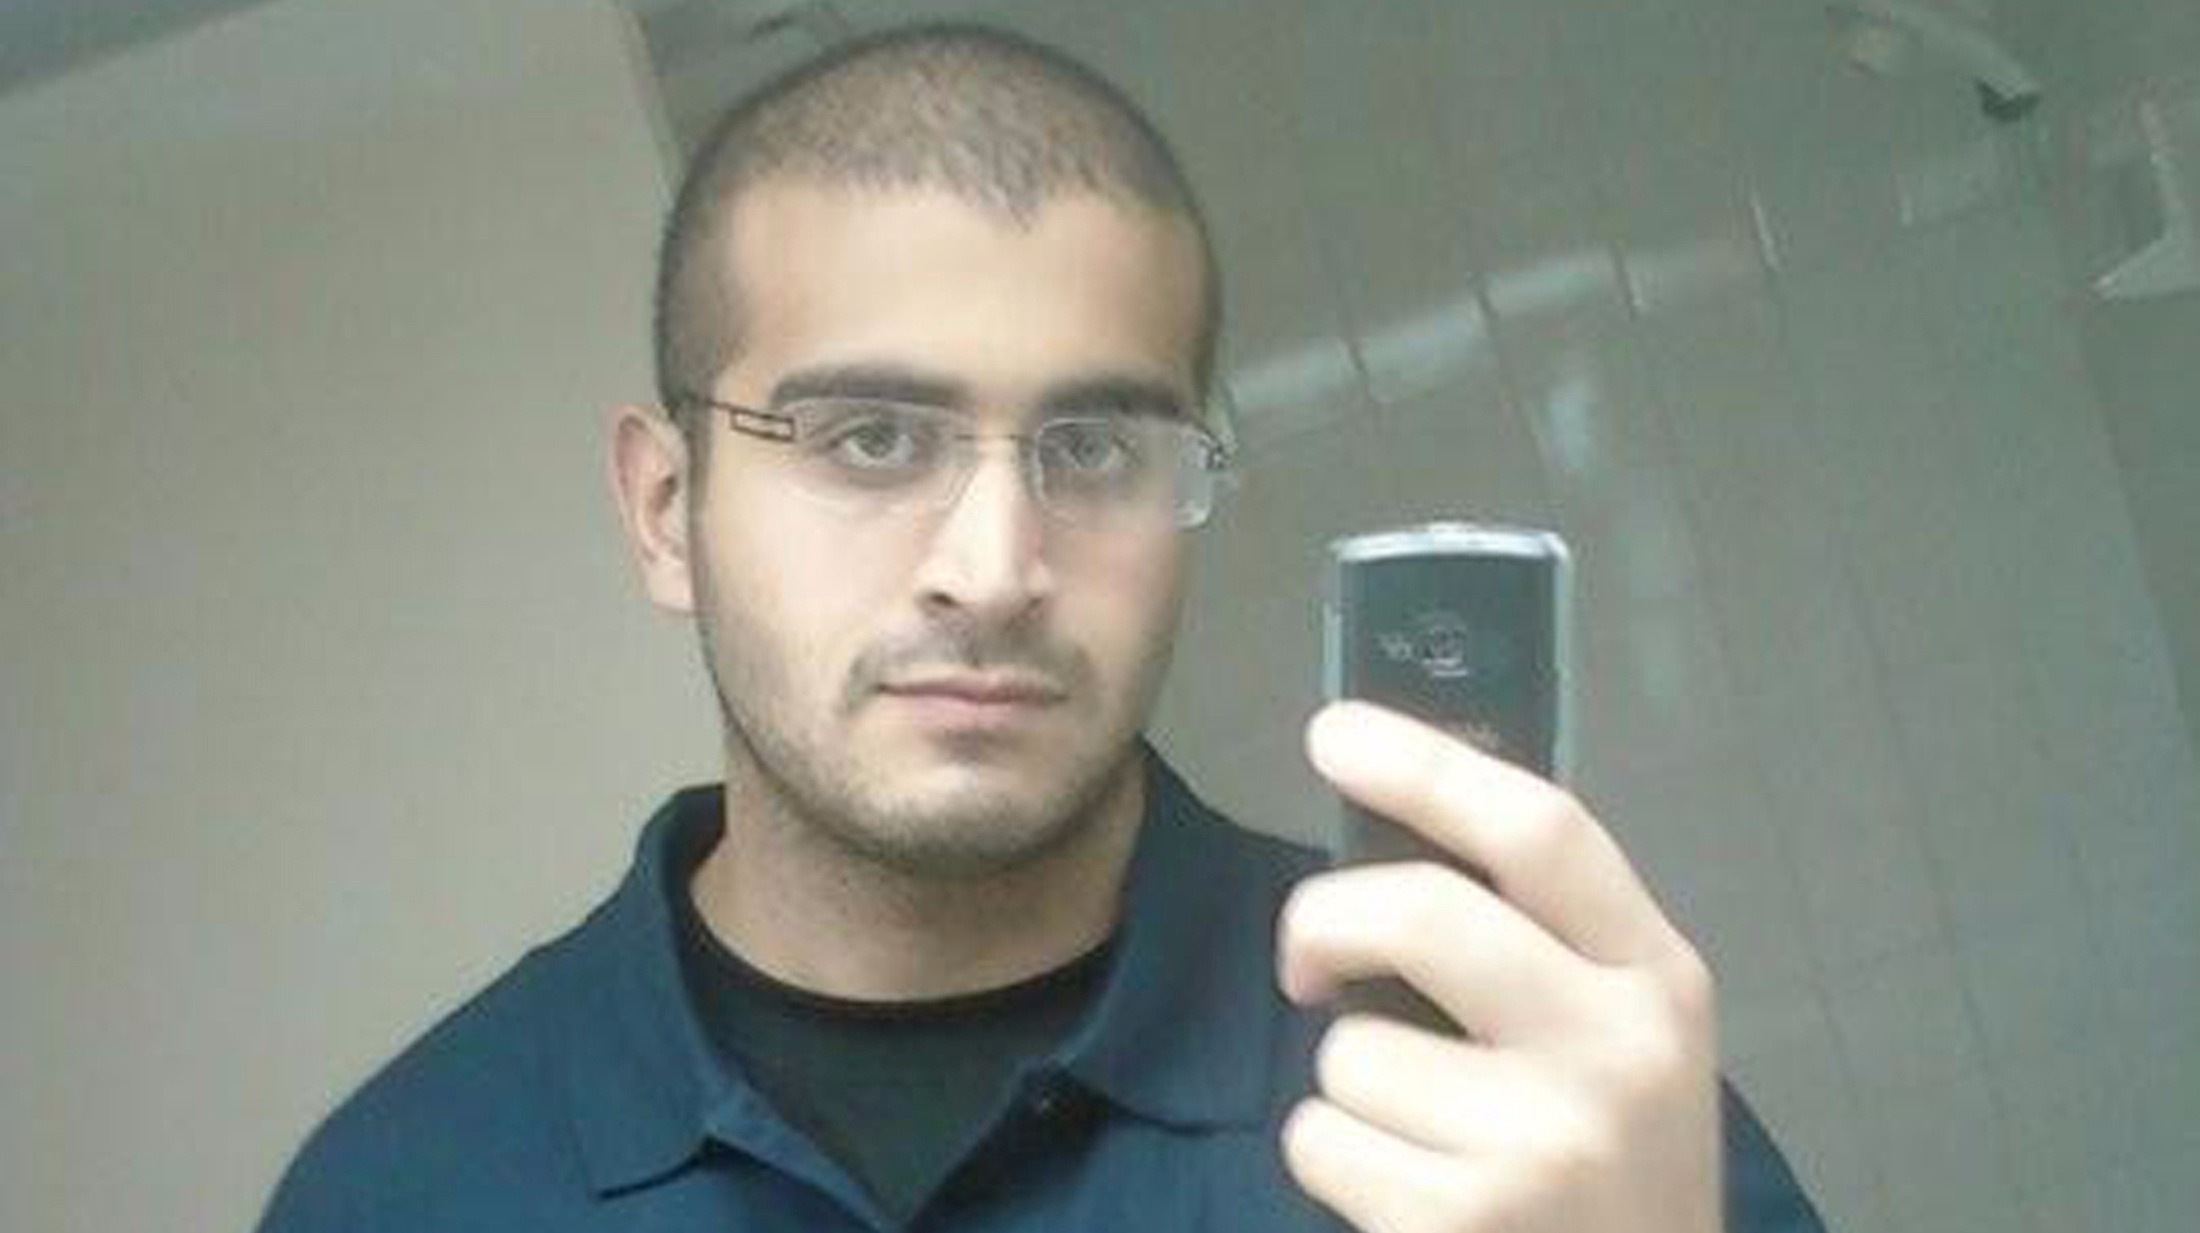 world news gunman been seen dating apps pulse nightclub before shooting